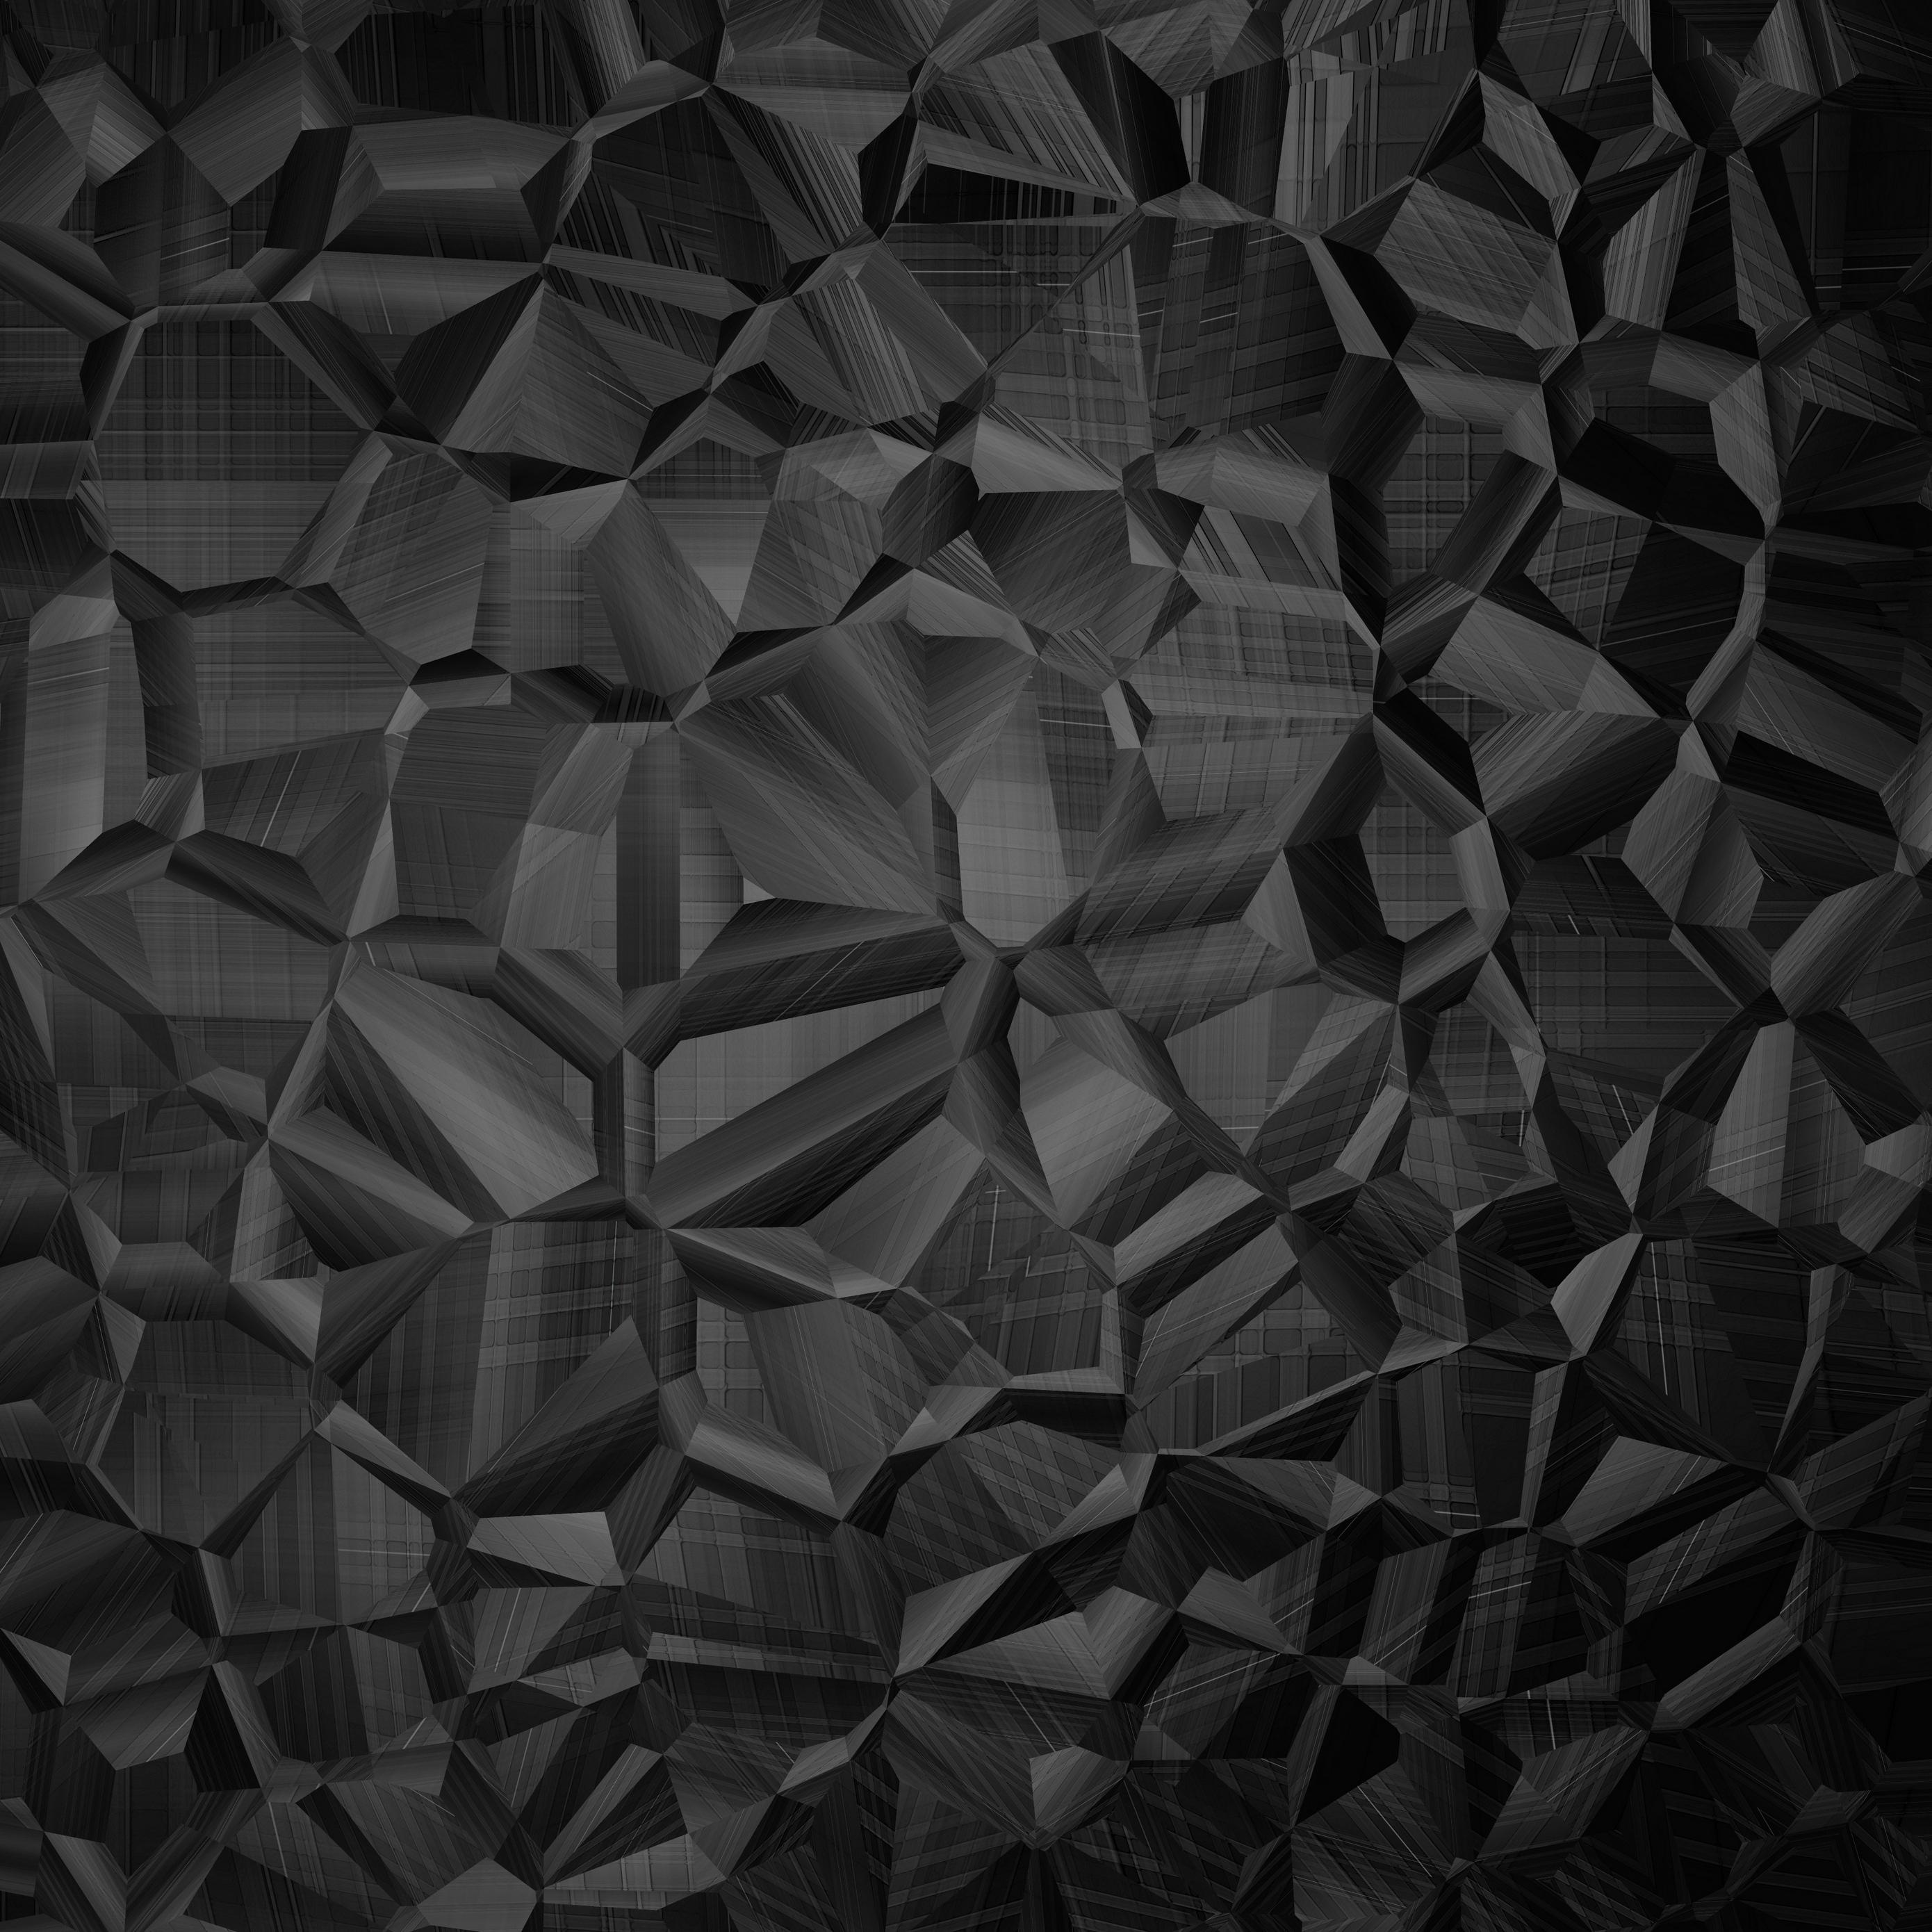 Download wallpaper 2780x2780 polygon surface black ipad air 2780x2780